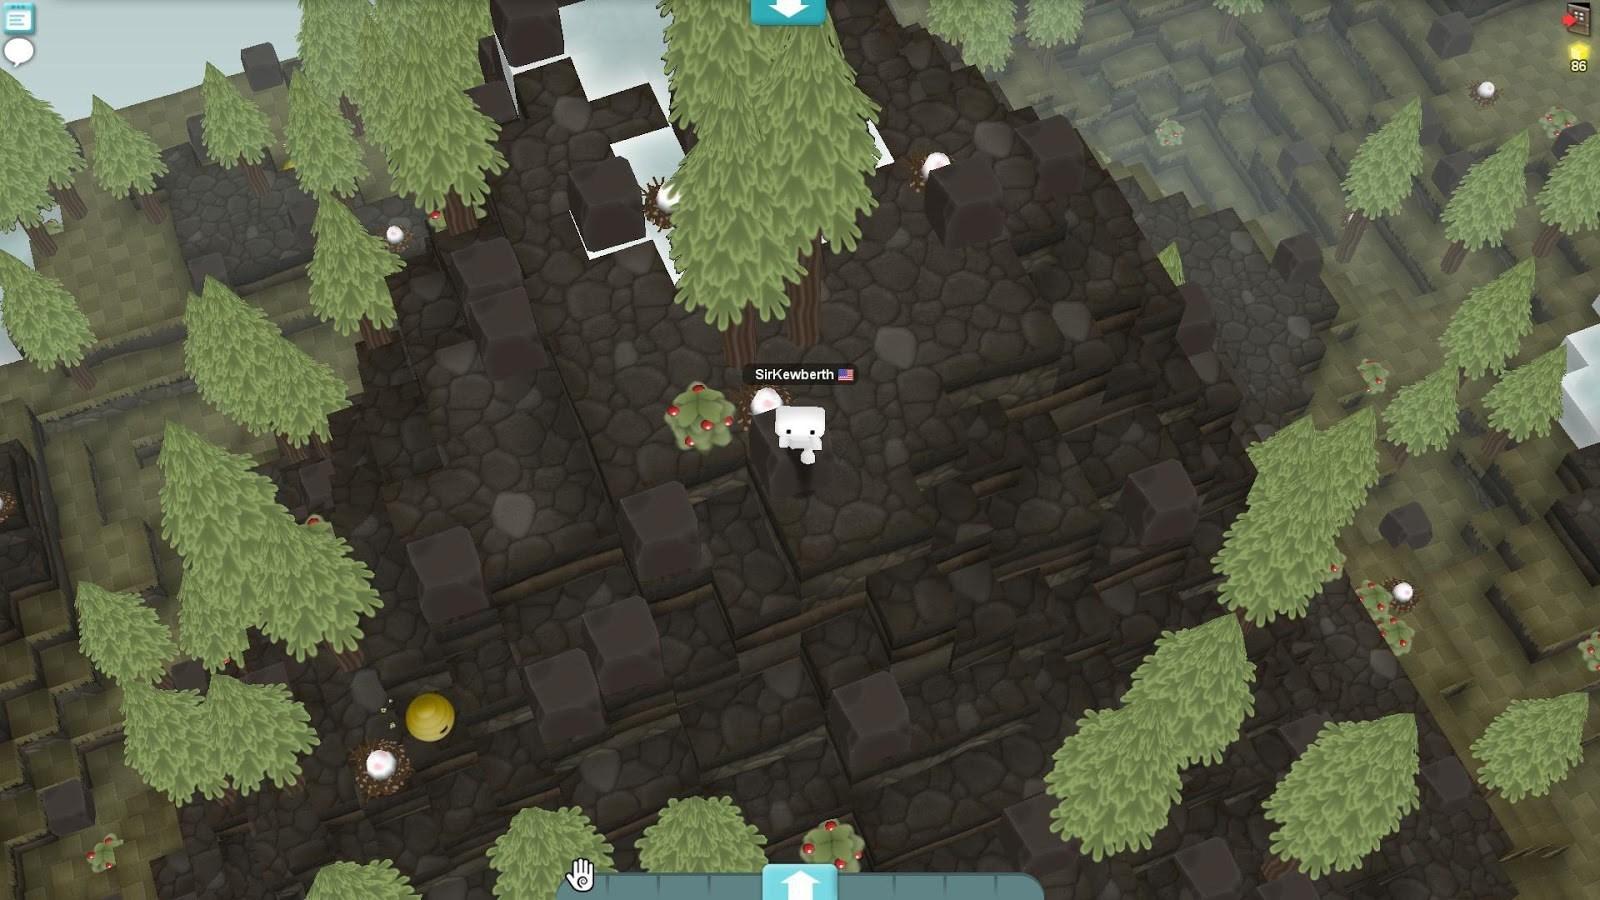 Cubic Castles - Imagem 1 do software